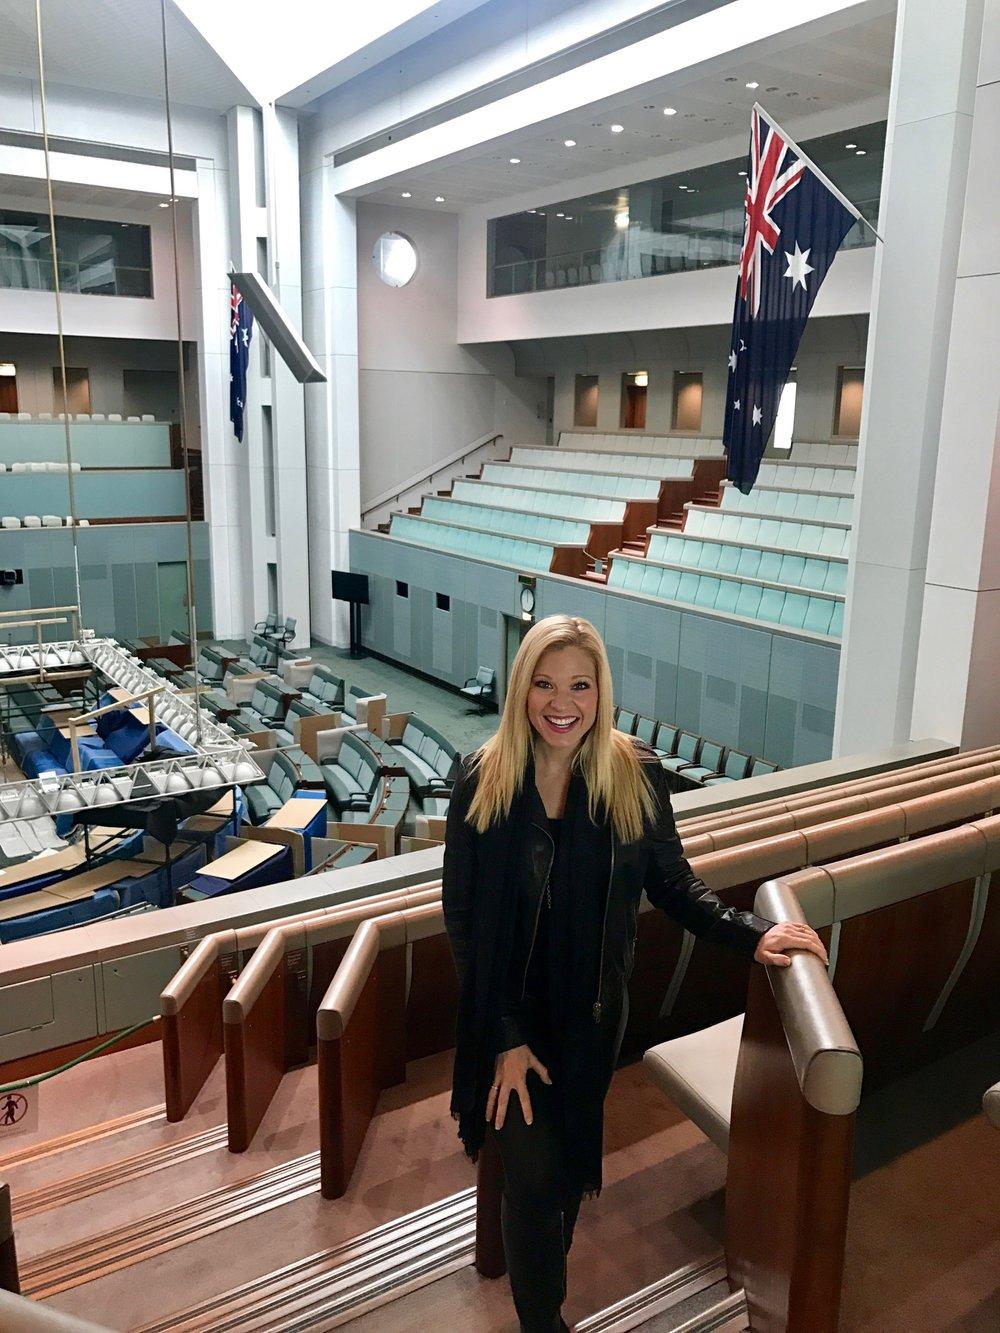 parliament house Australia annakooiman.com